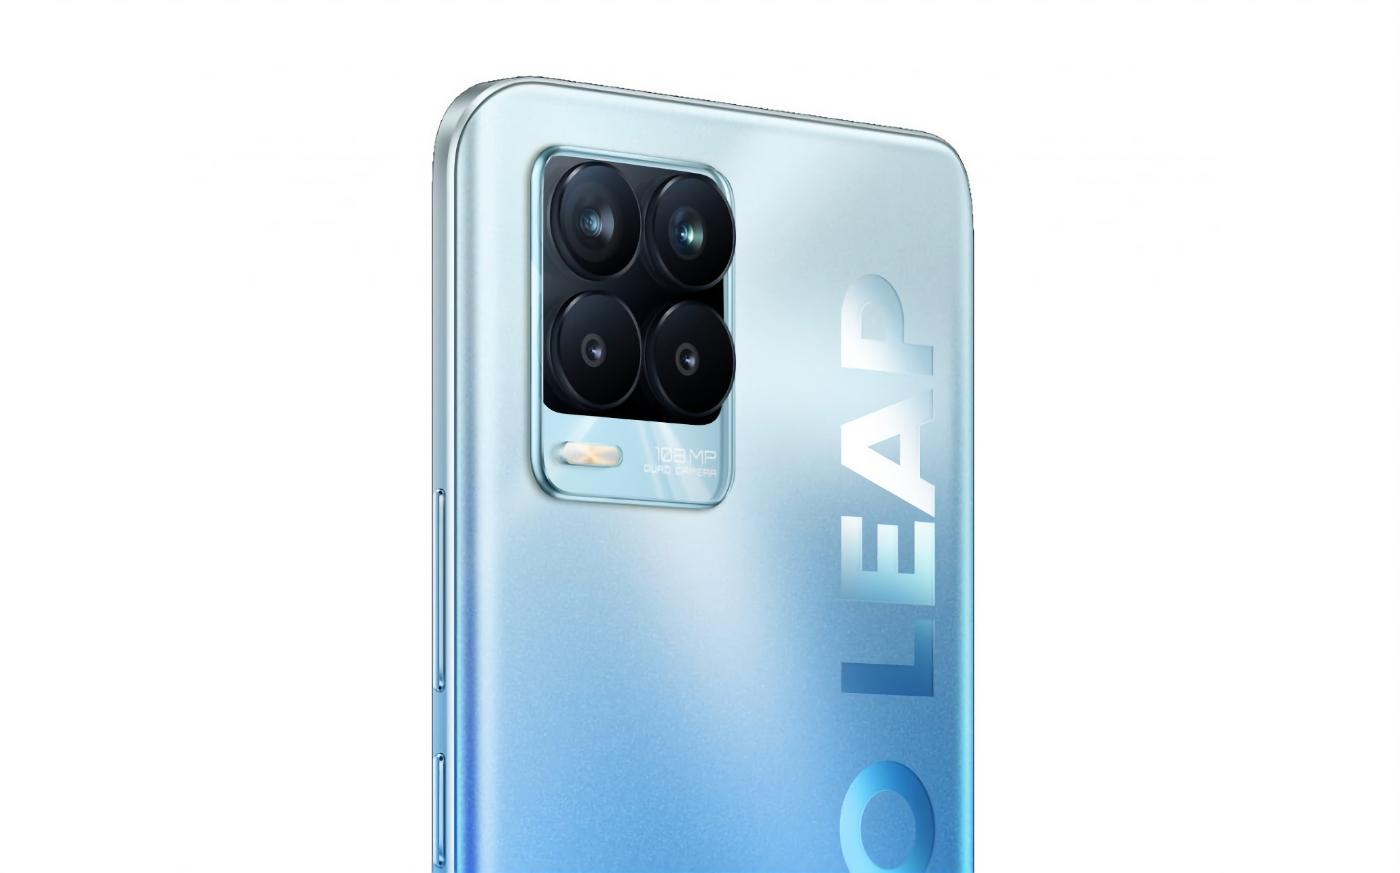 CEO Realme раскрыл спецификации Realme 8: AMOLED-дисплей, чип MediaTek Helio G95 и батарея на 5000 мАч